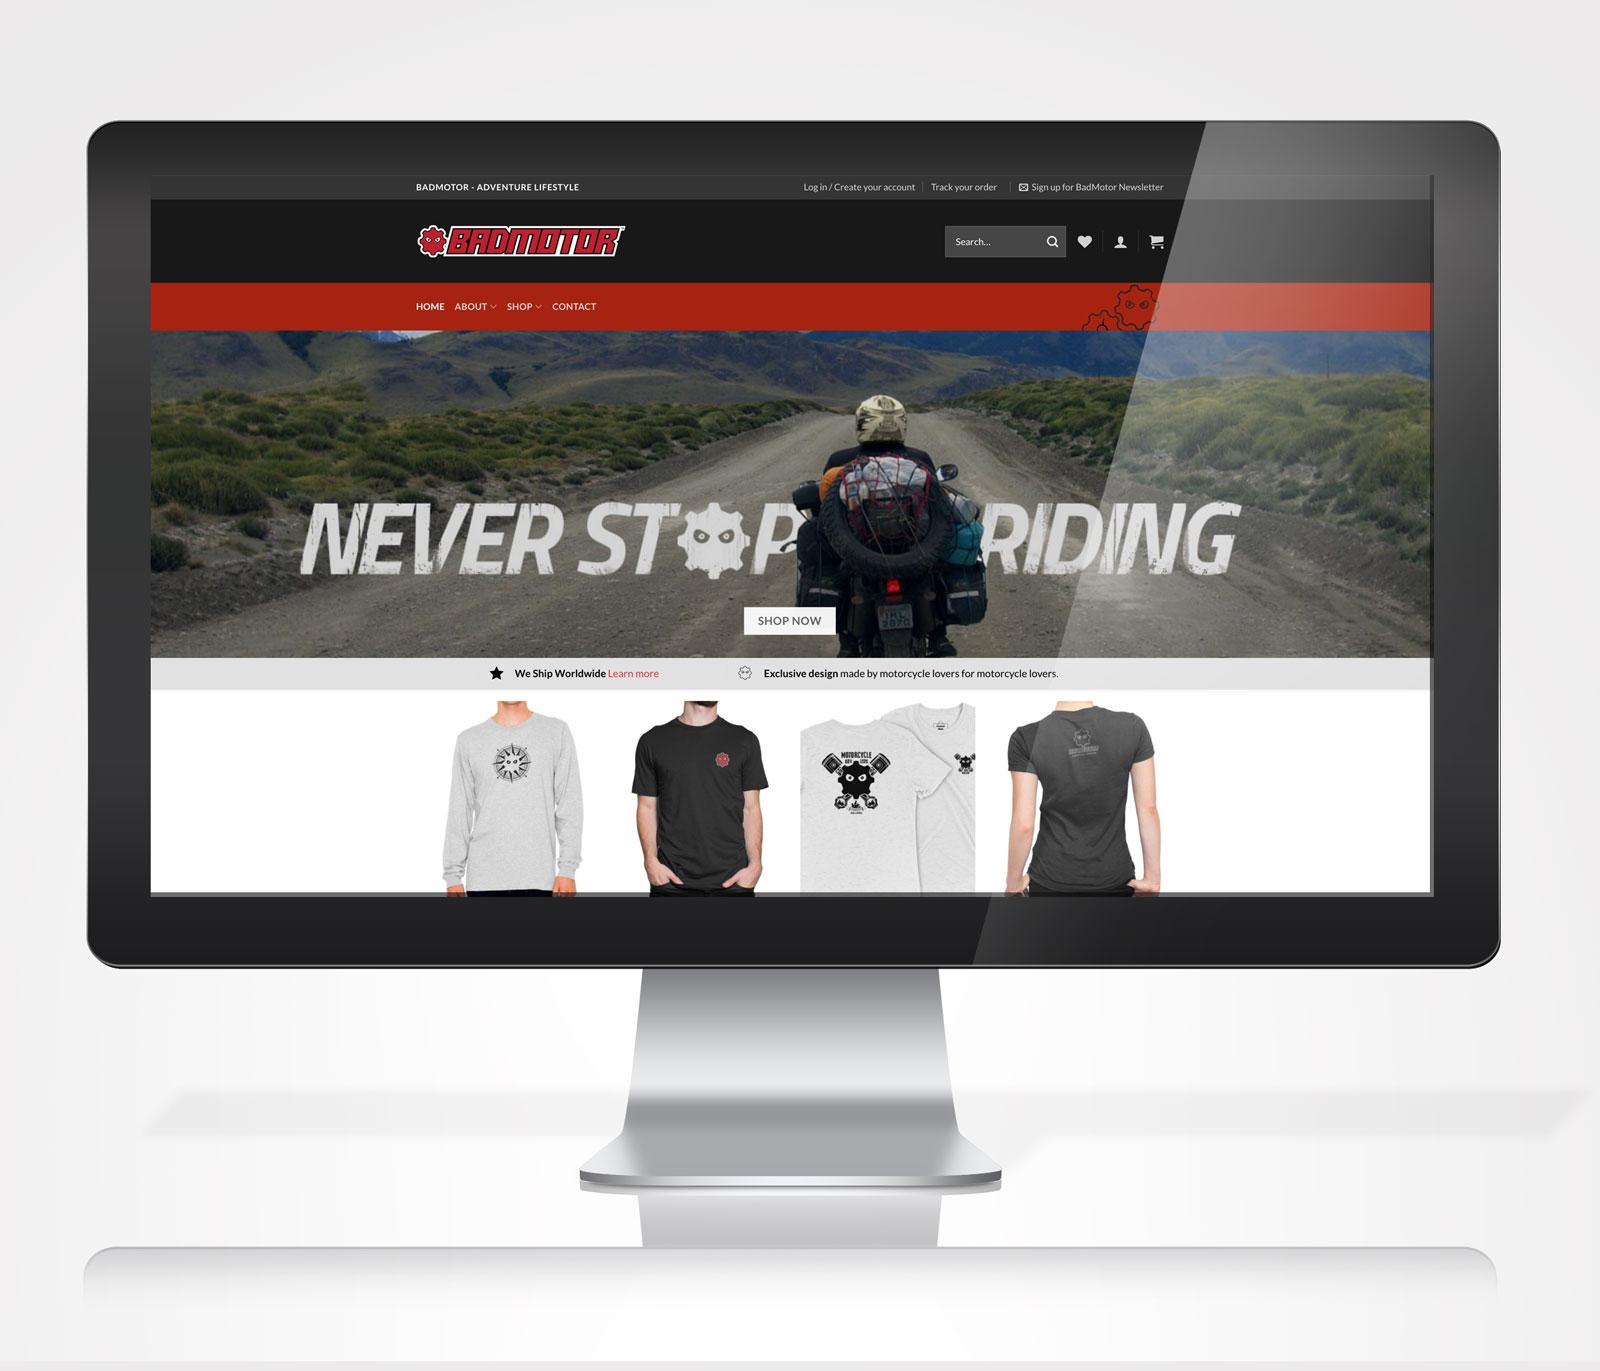 badmotorwebsite-imac